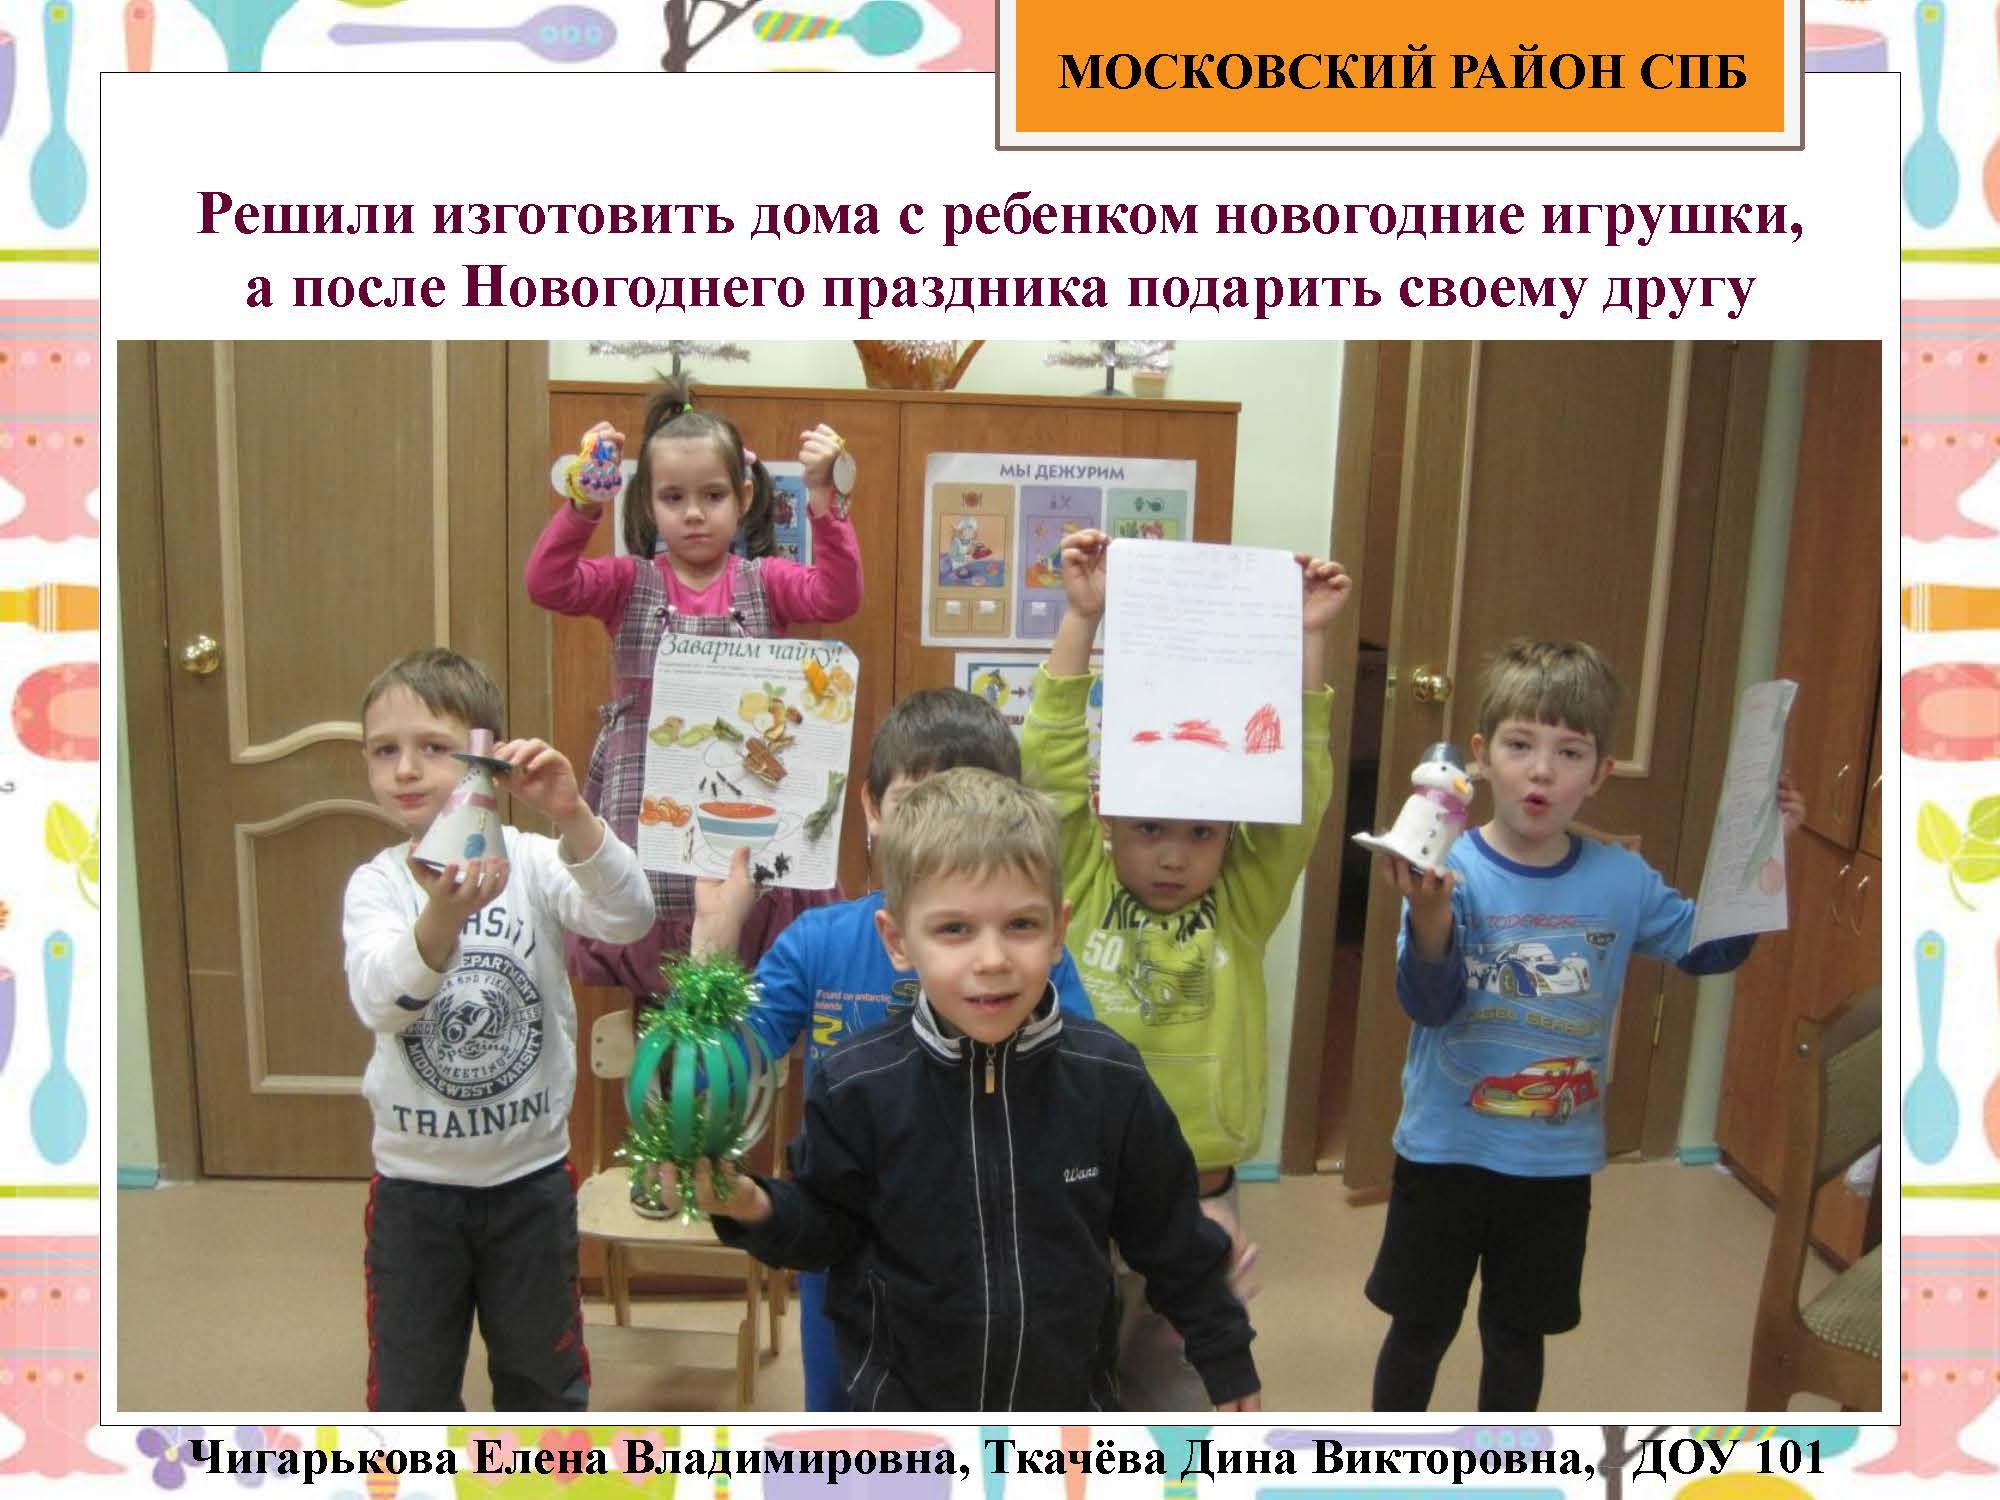 Секция 8. ДОУ 101, ПСИ. Московский район_Страница_18